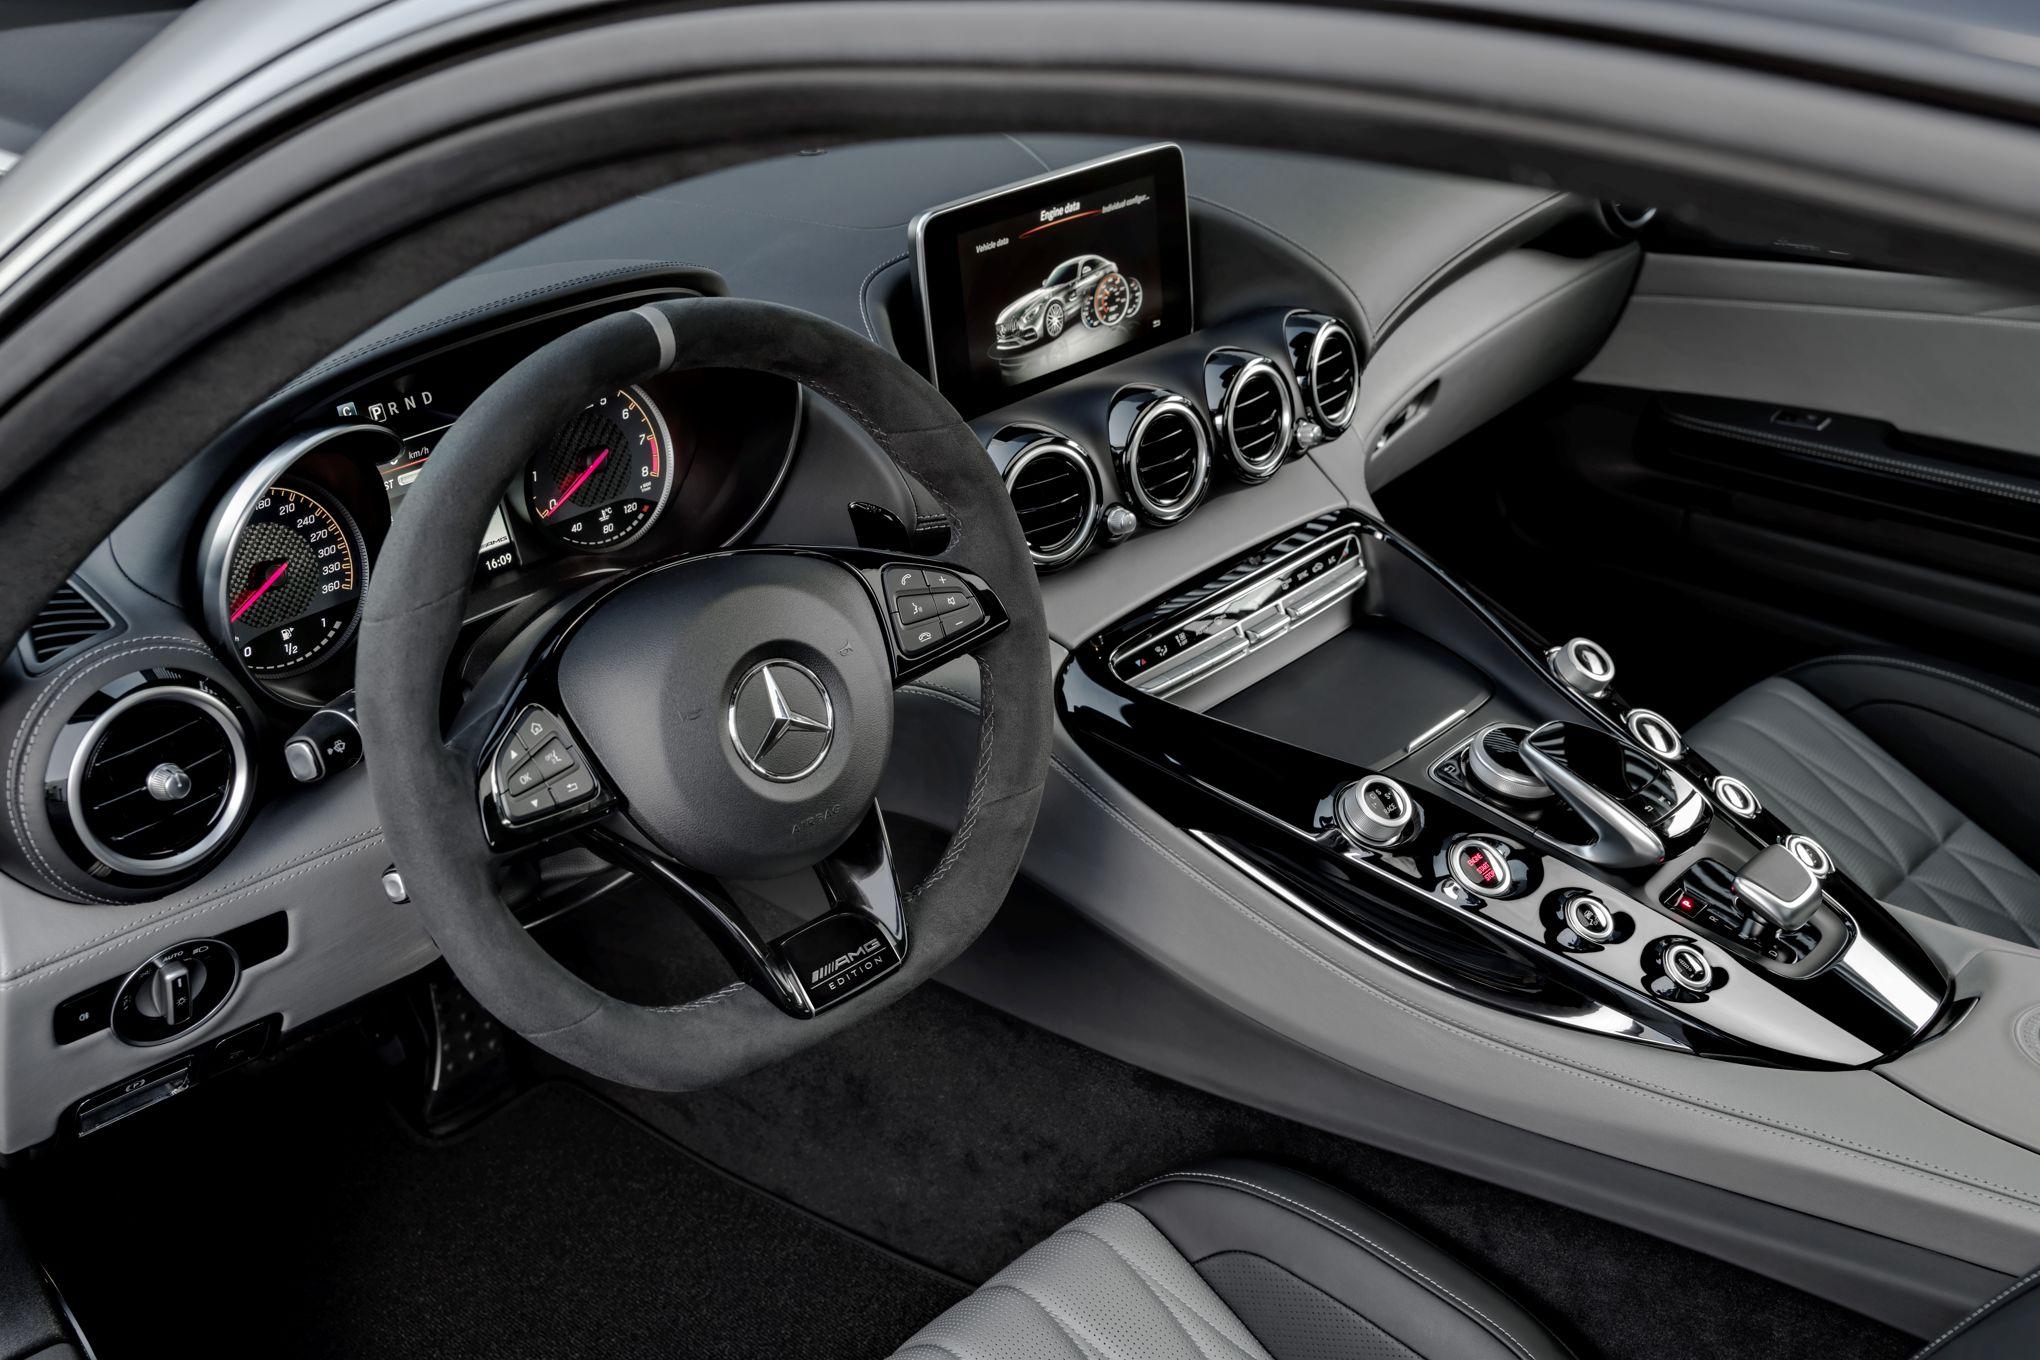 2019 - [BMW] Série 8 Gran Coupé [G16] - Page 4 XVM4377aeb4-d75e-11e6-af62-787f14c203b5-300x200